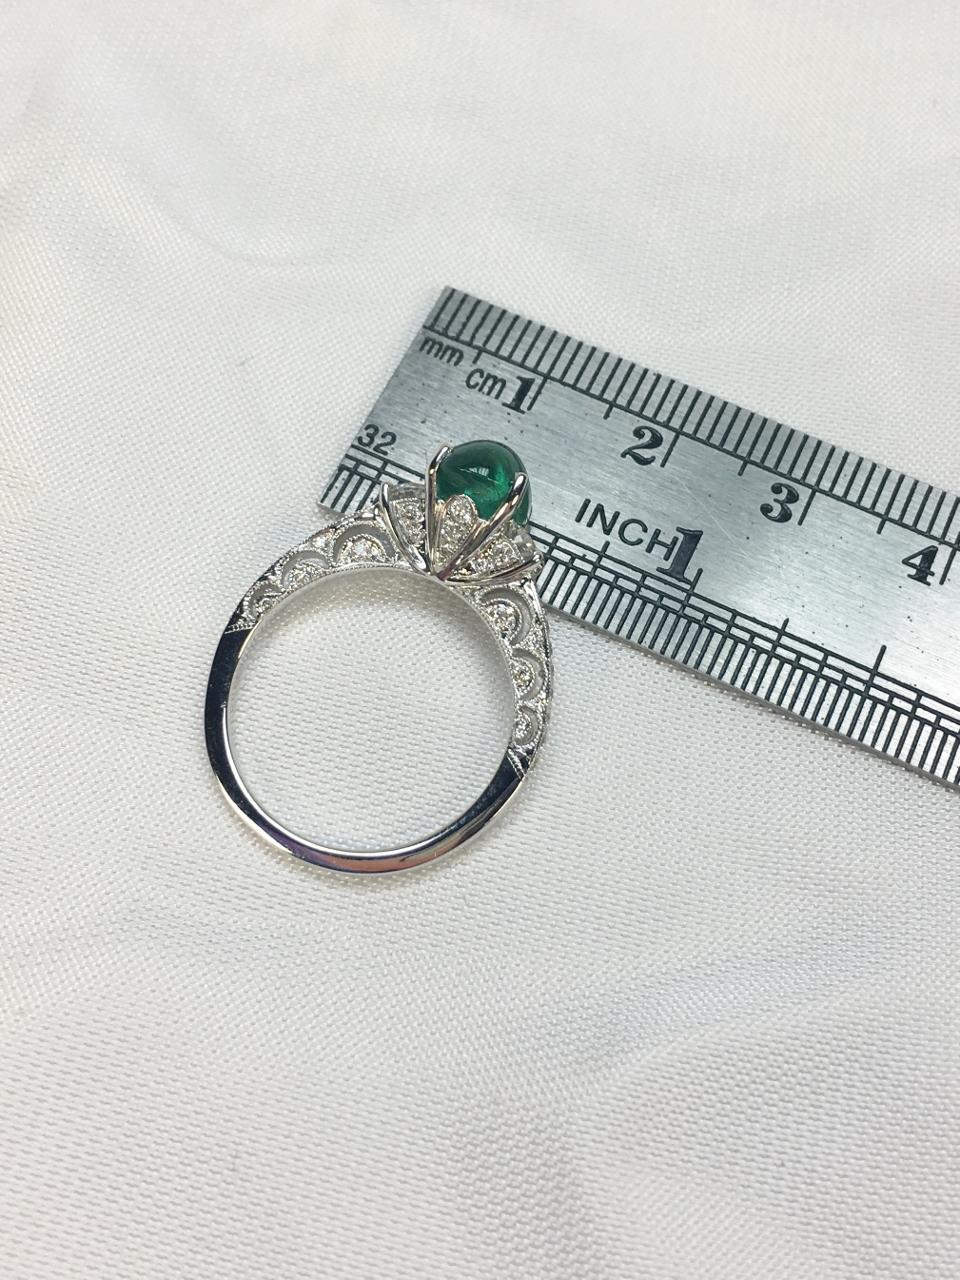 Over 2 Carats Cabochon Emerald Diamond White Gold Ring